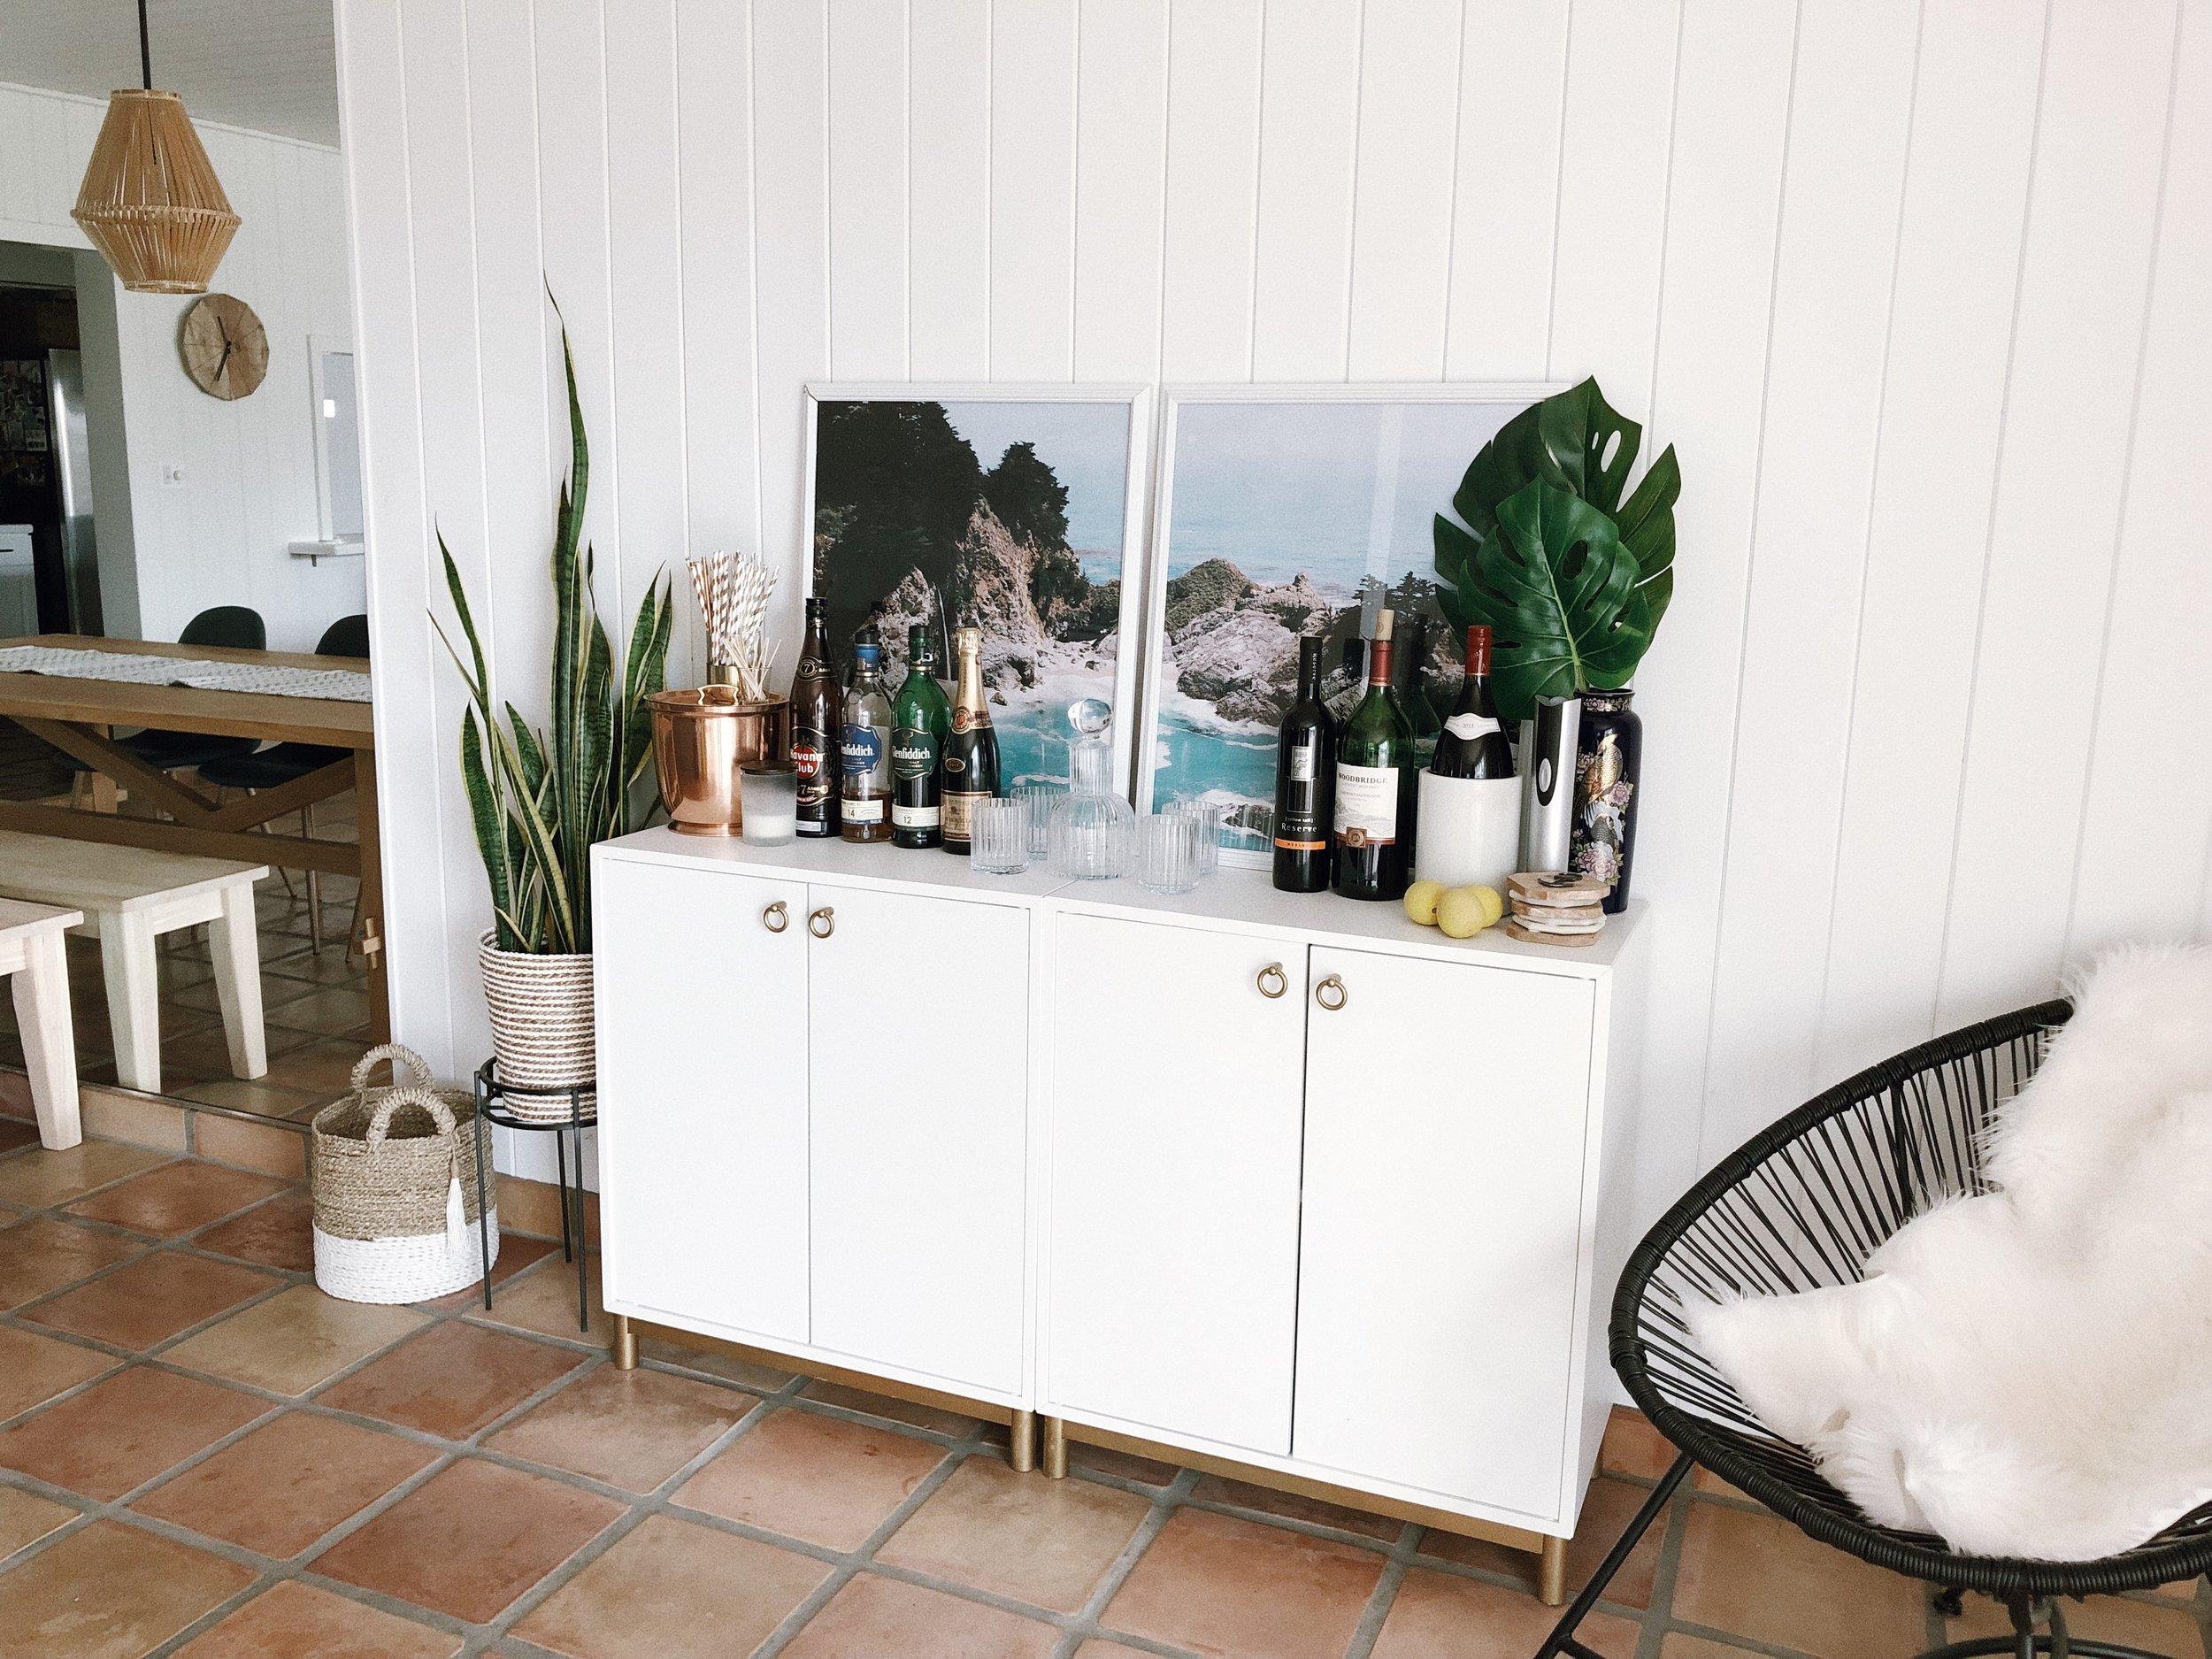 Modern Bohemian Home Decor Living Room Interior Design bar cart.jpg